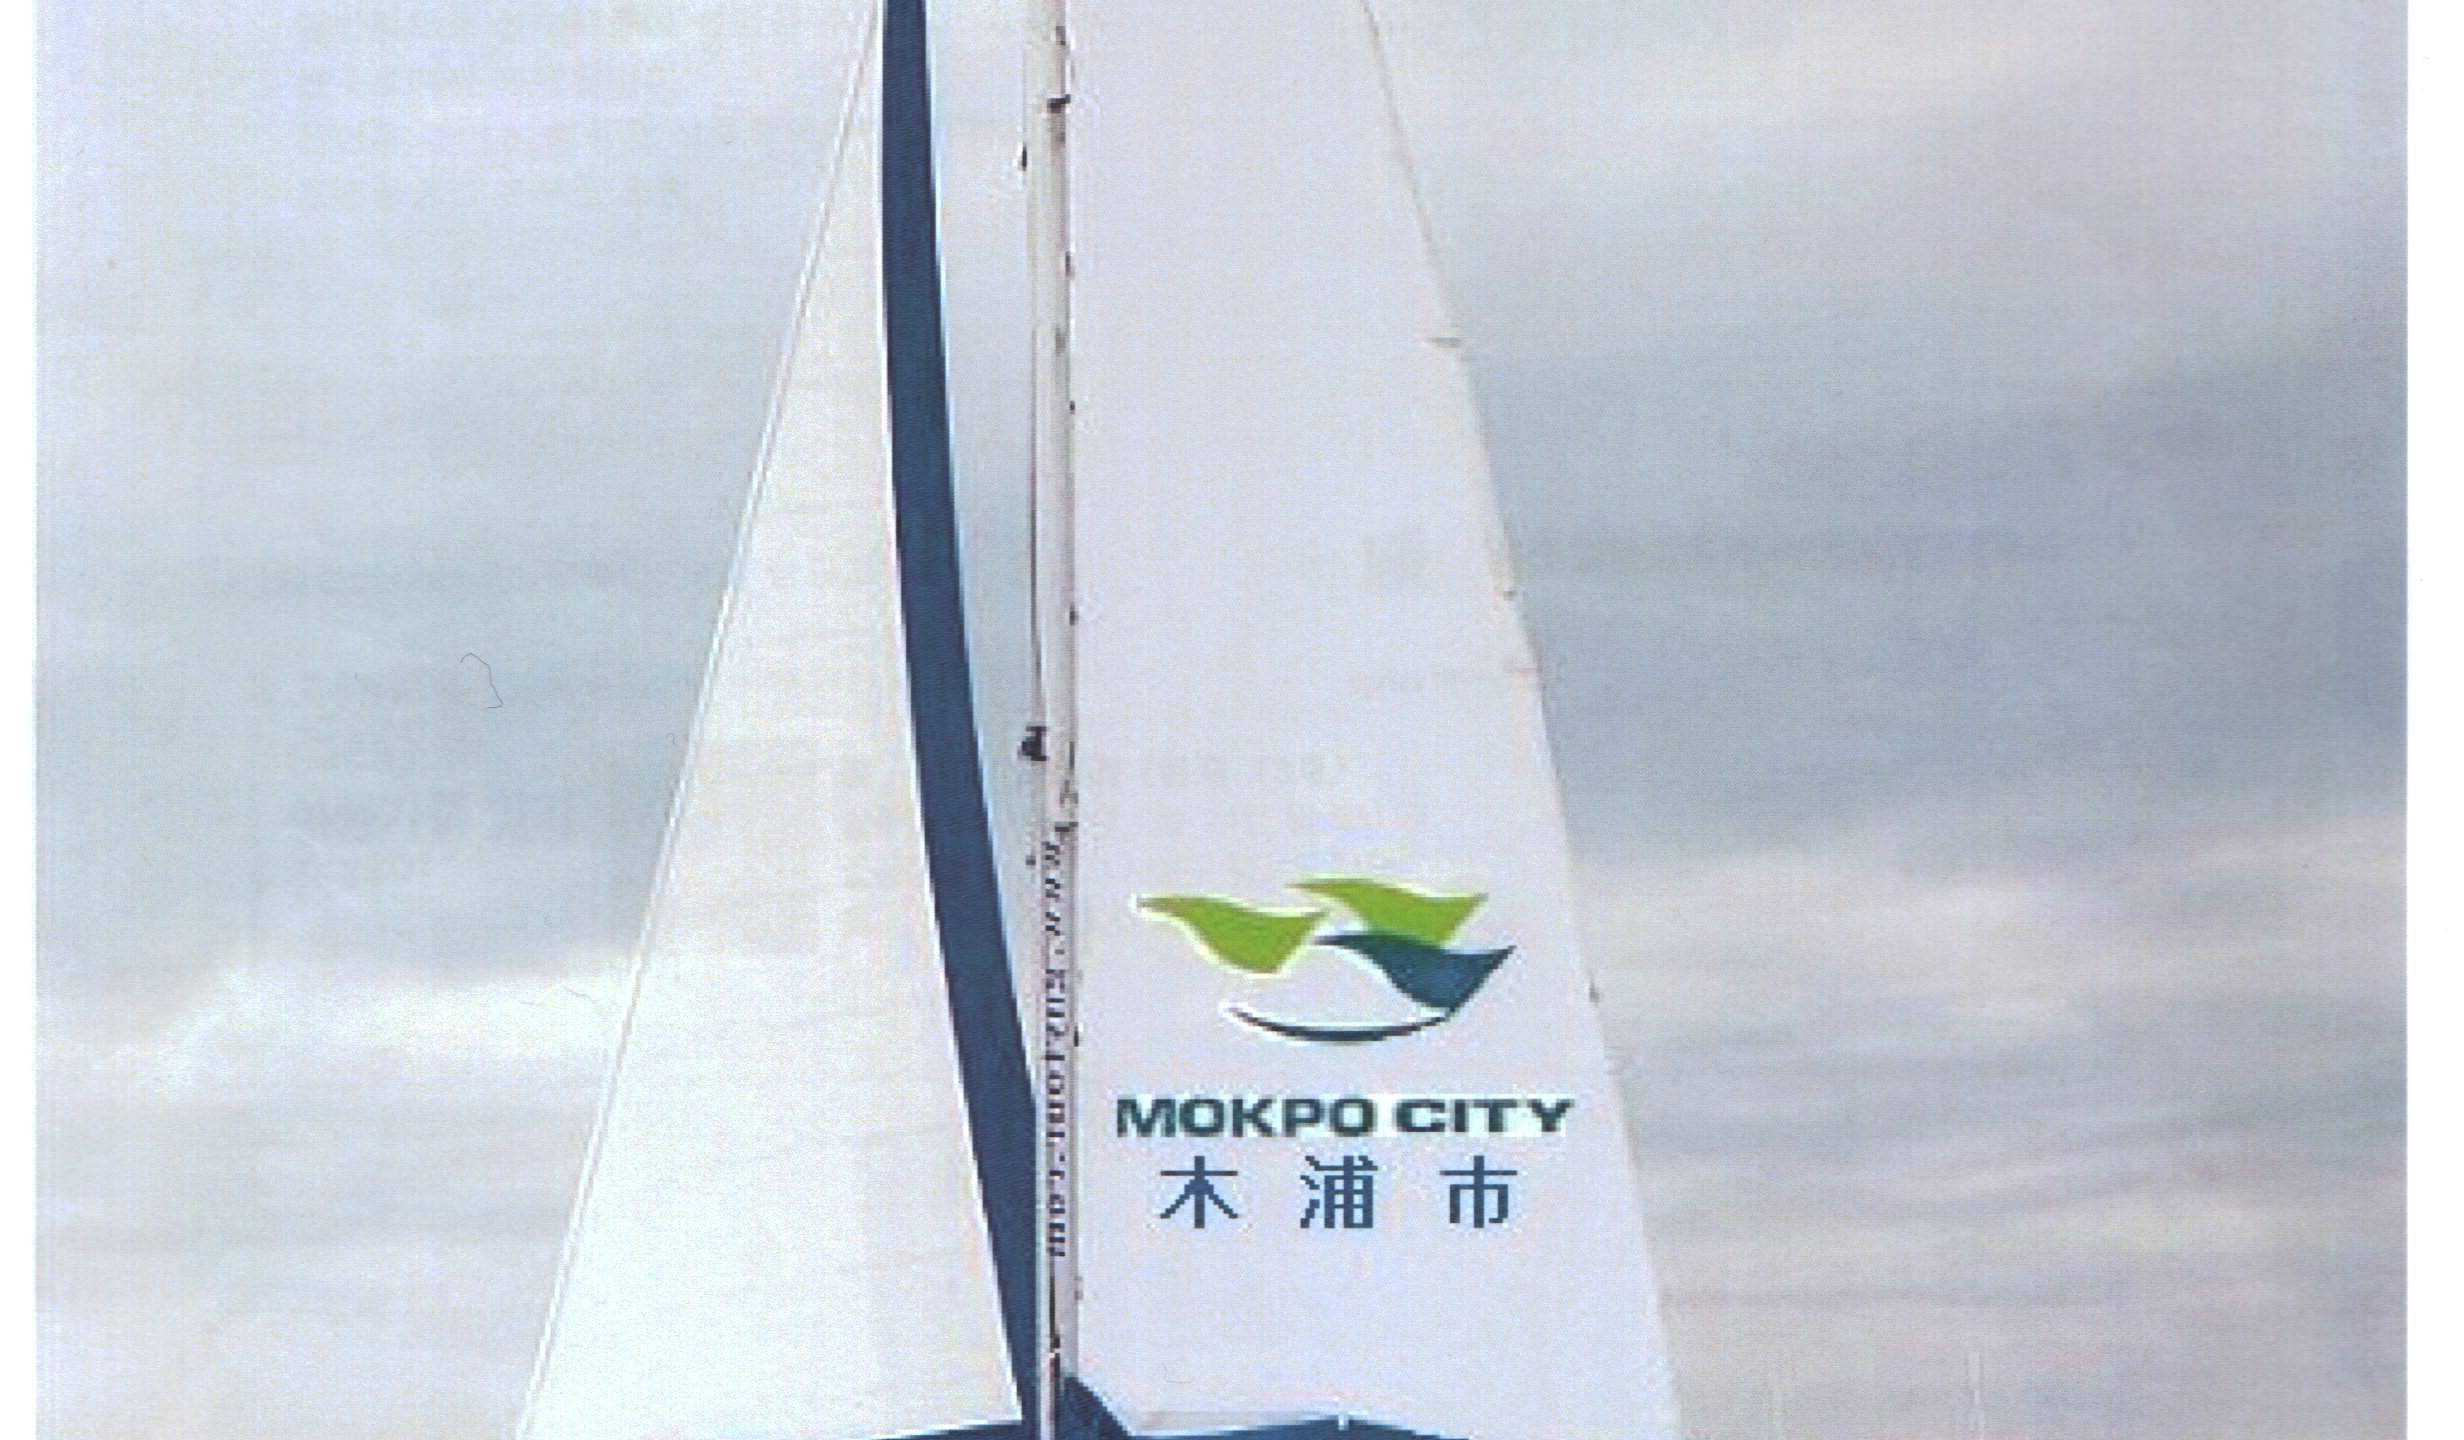 Sail Catamaran51 - Mokpo yachts